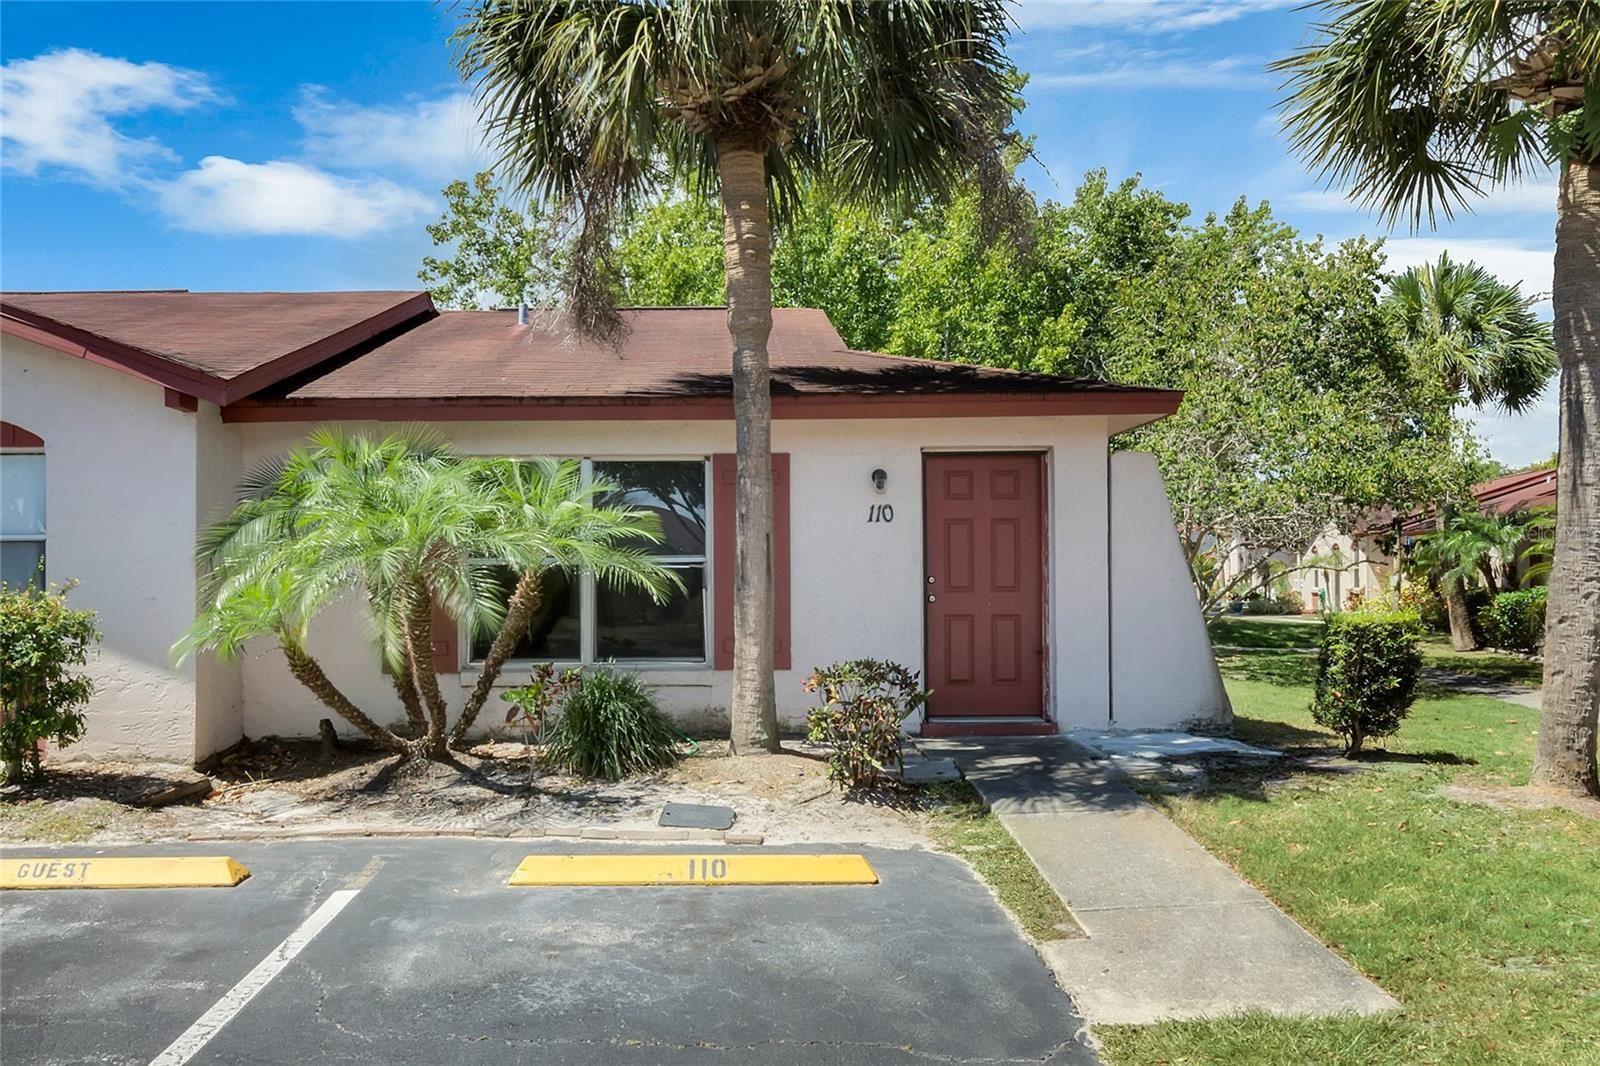 110 E MARBRISA WAY, Kissimmee, FL 34743 - #: O5948260